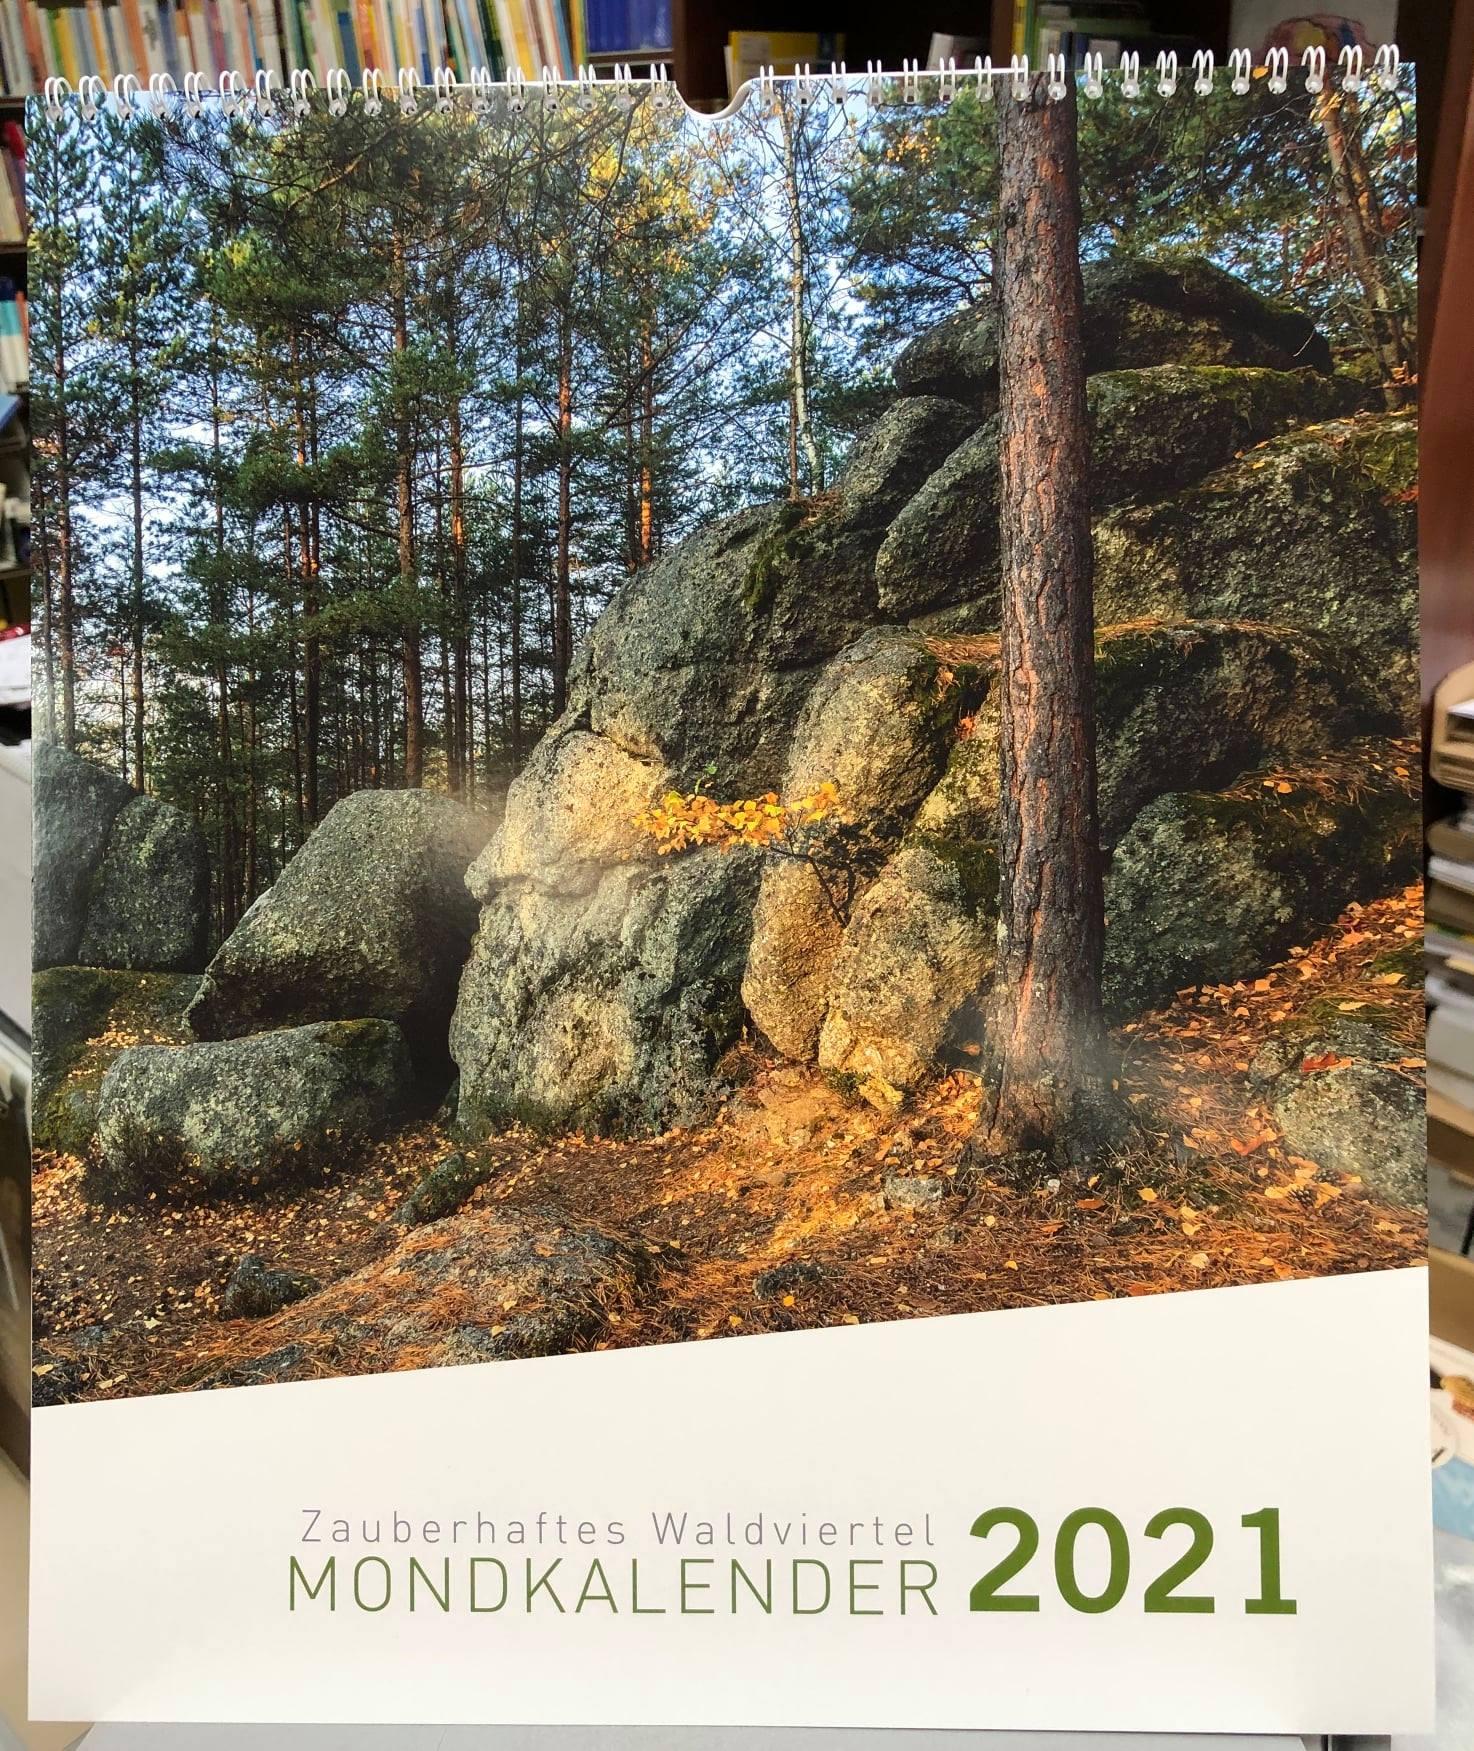 Zauberhaftes Waldviertel Mondkalender 2021